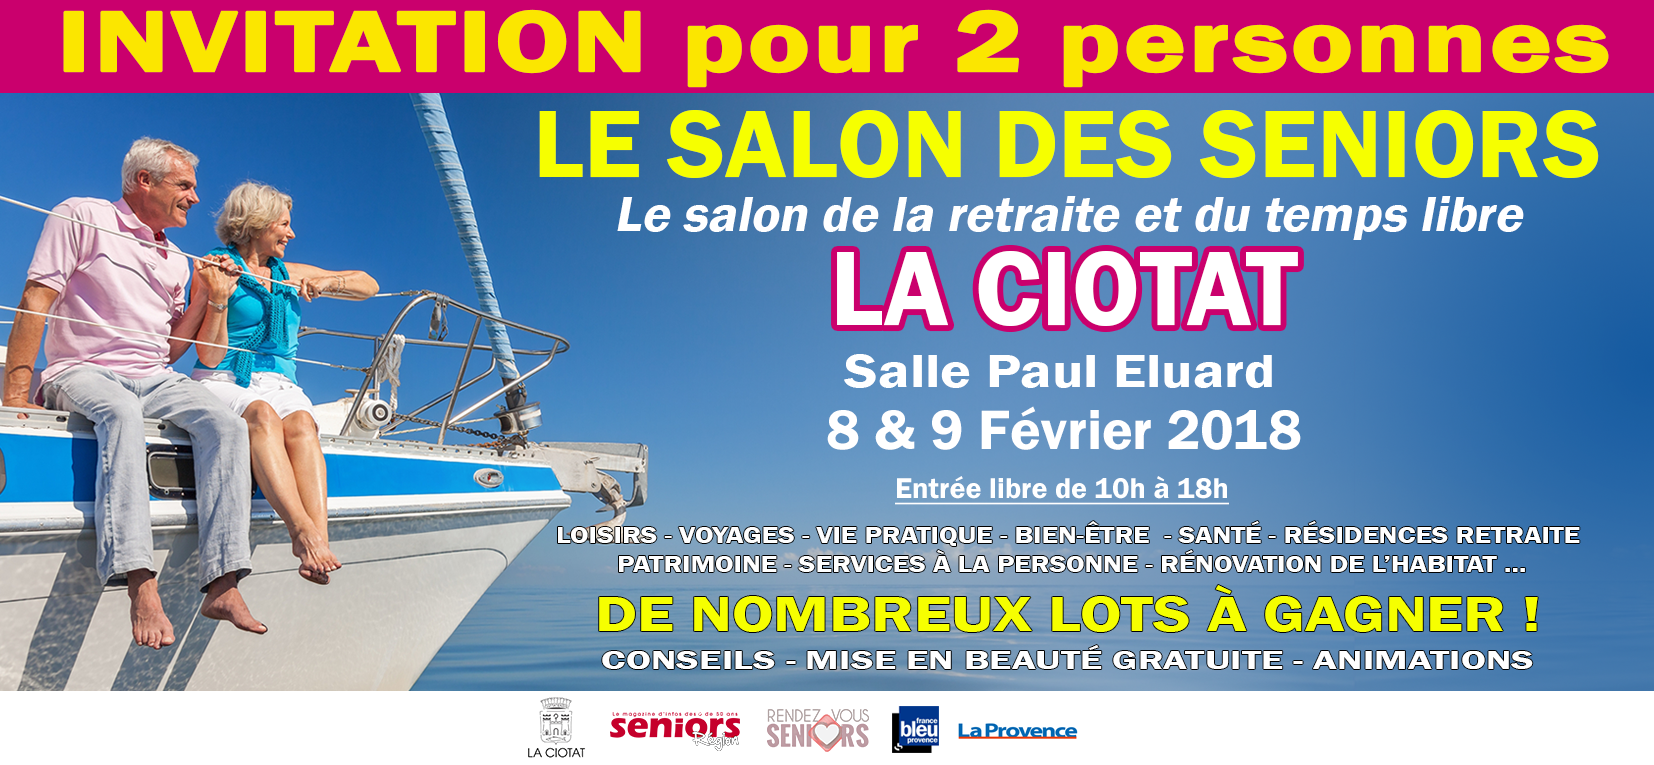 Le Salon Des Seniors De La Ciotat 2018